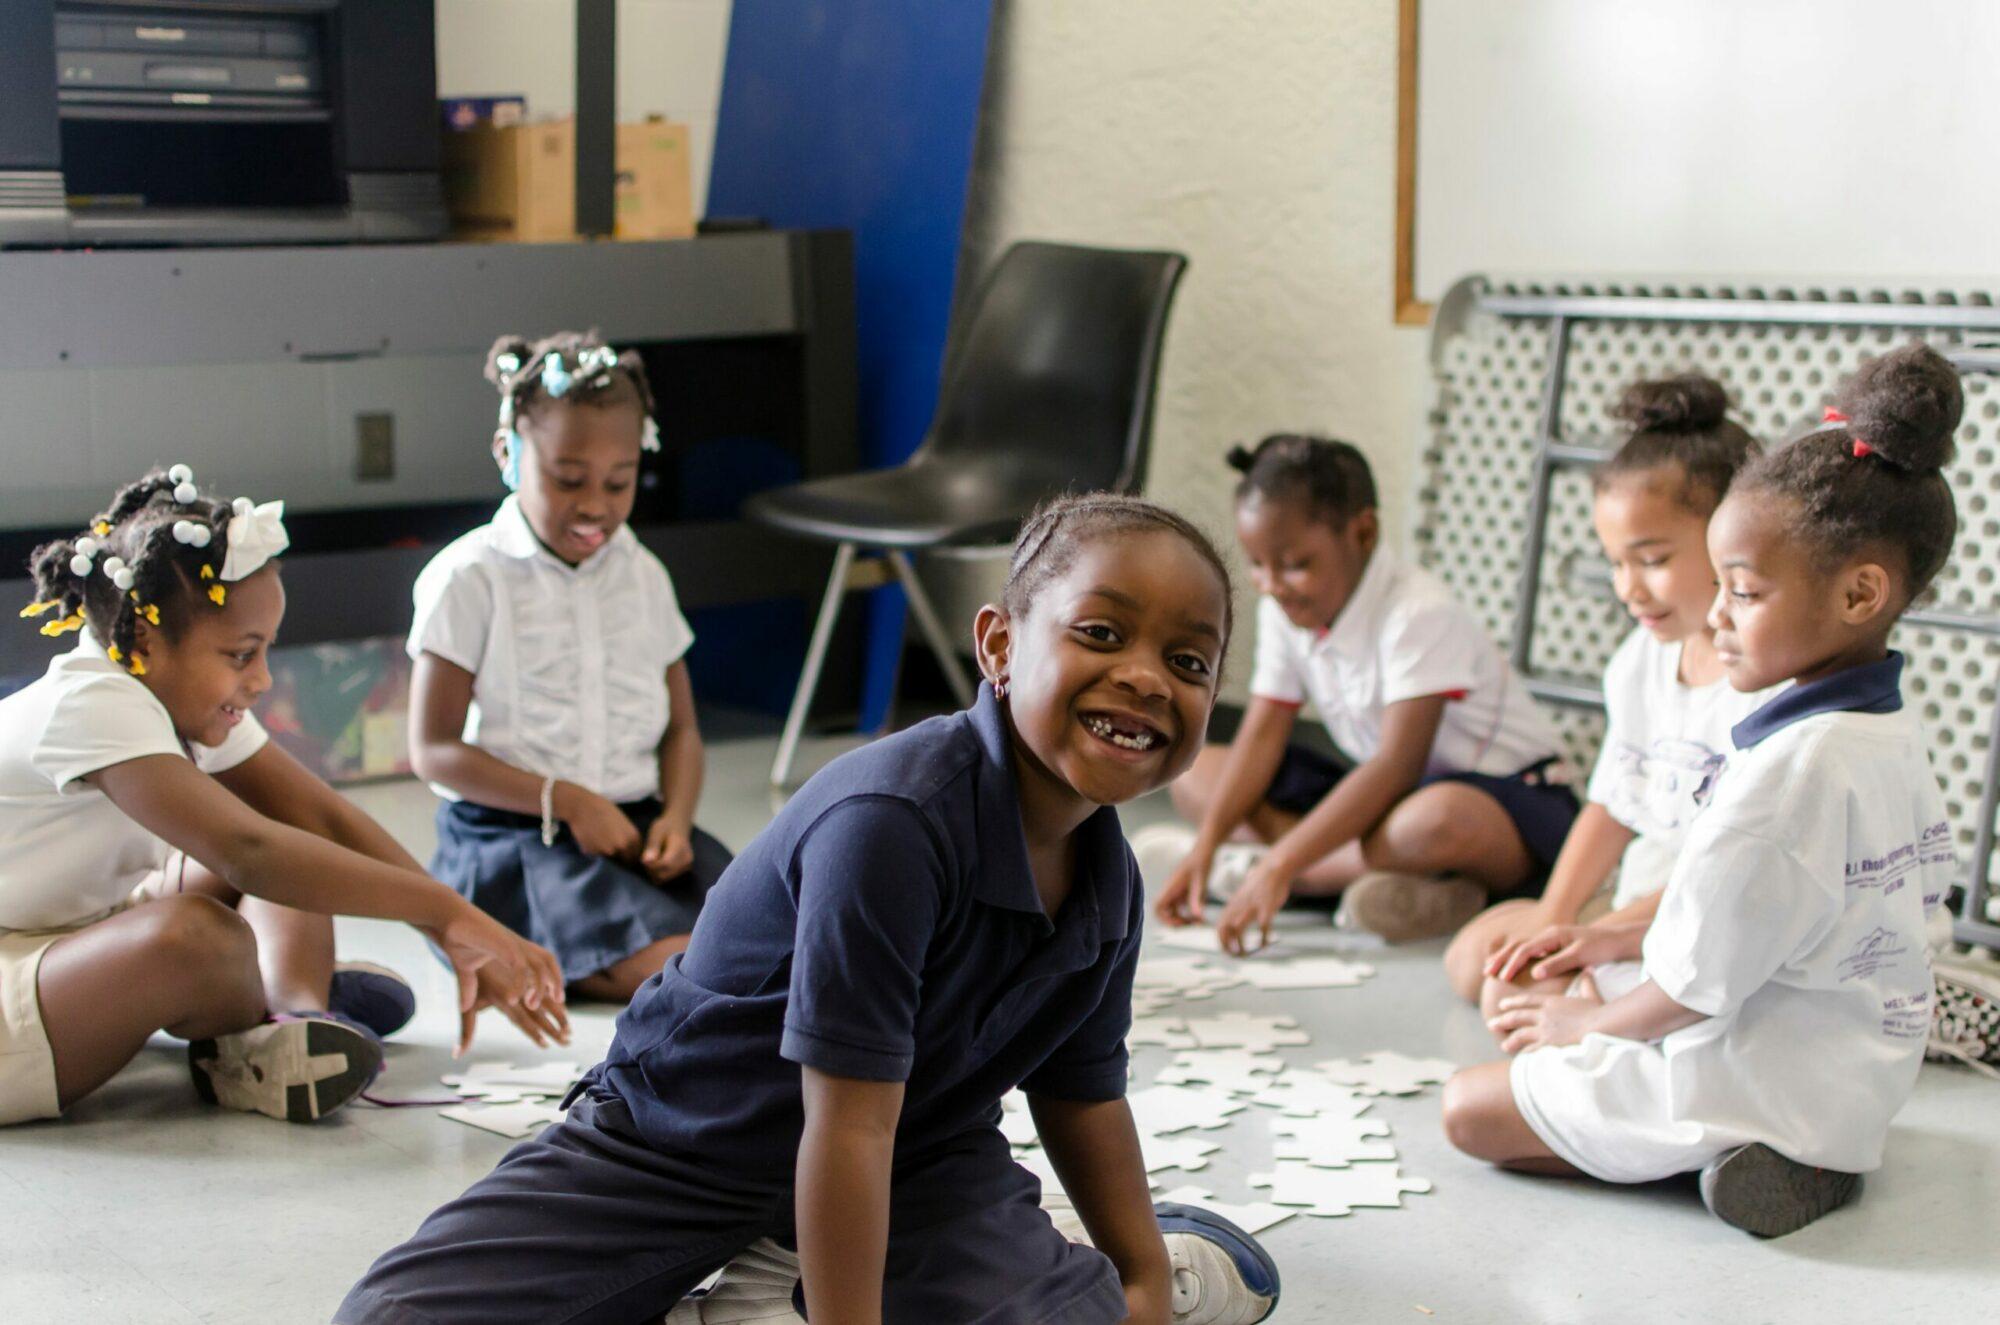 Charles & Margery Barancik Foundation Board Grants $3.2 Million to Bridge Social Service Gaps